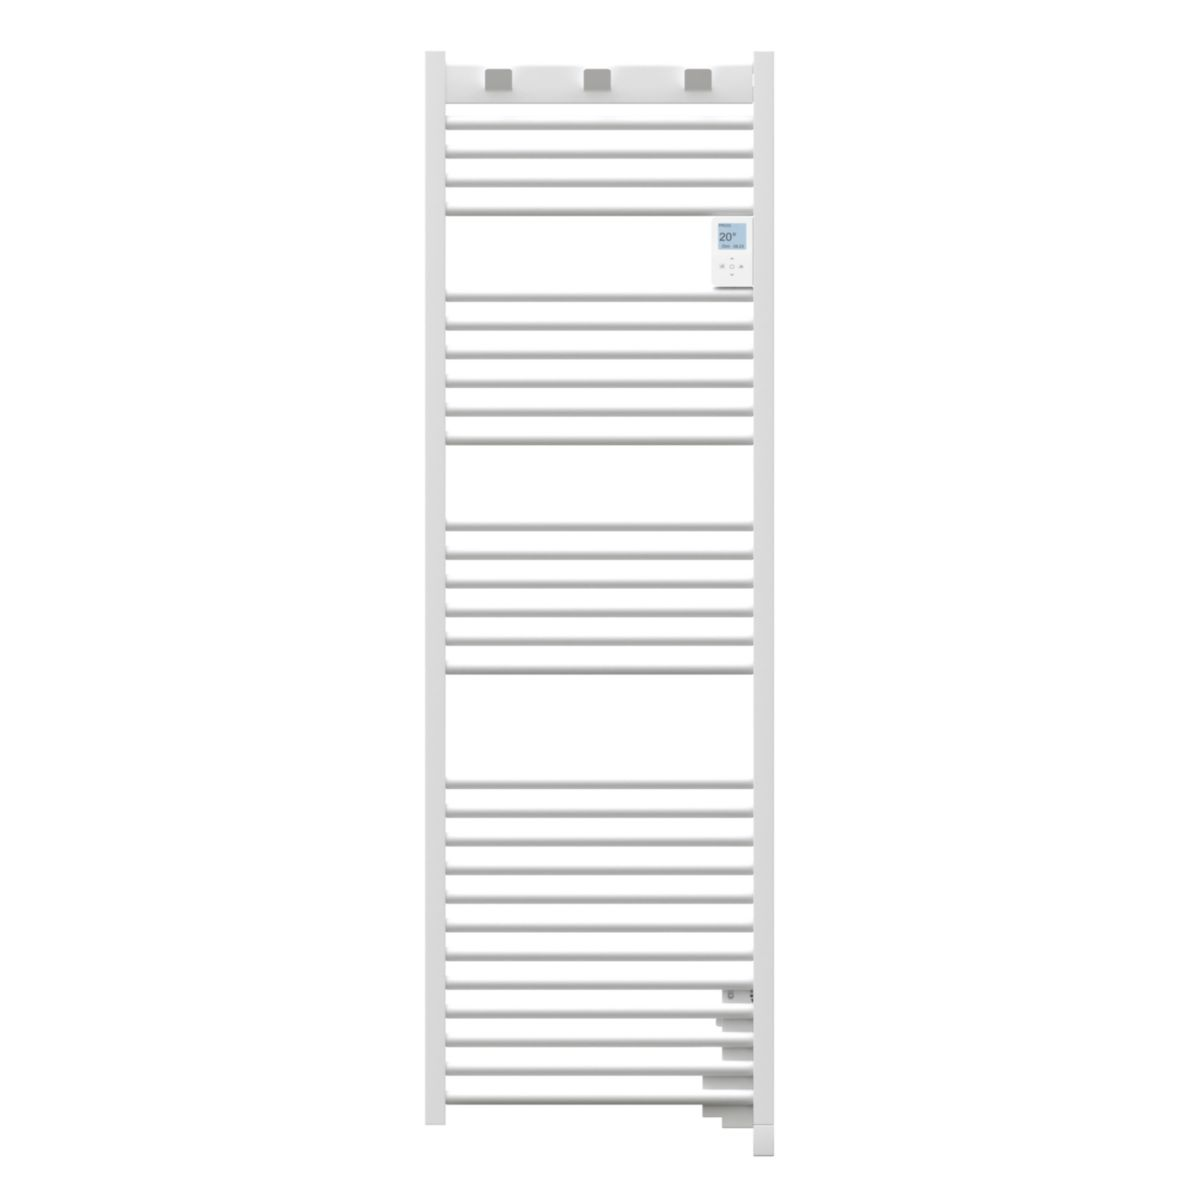 Radiateur sèche serviettes doris digital 750 w blanc réf 850140